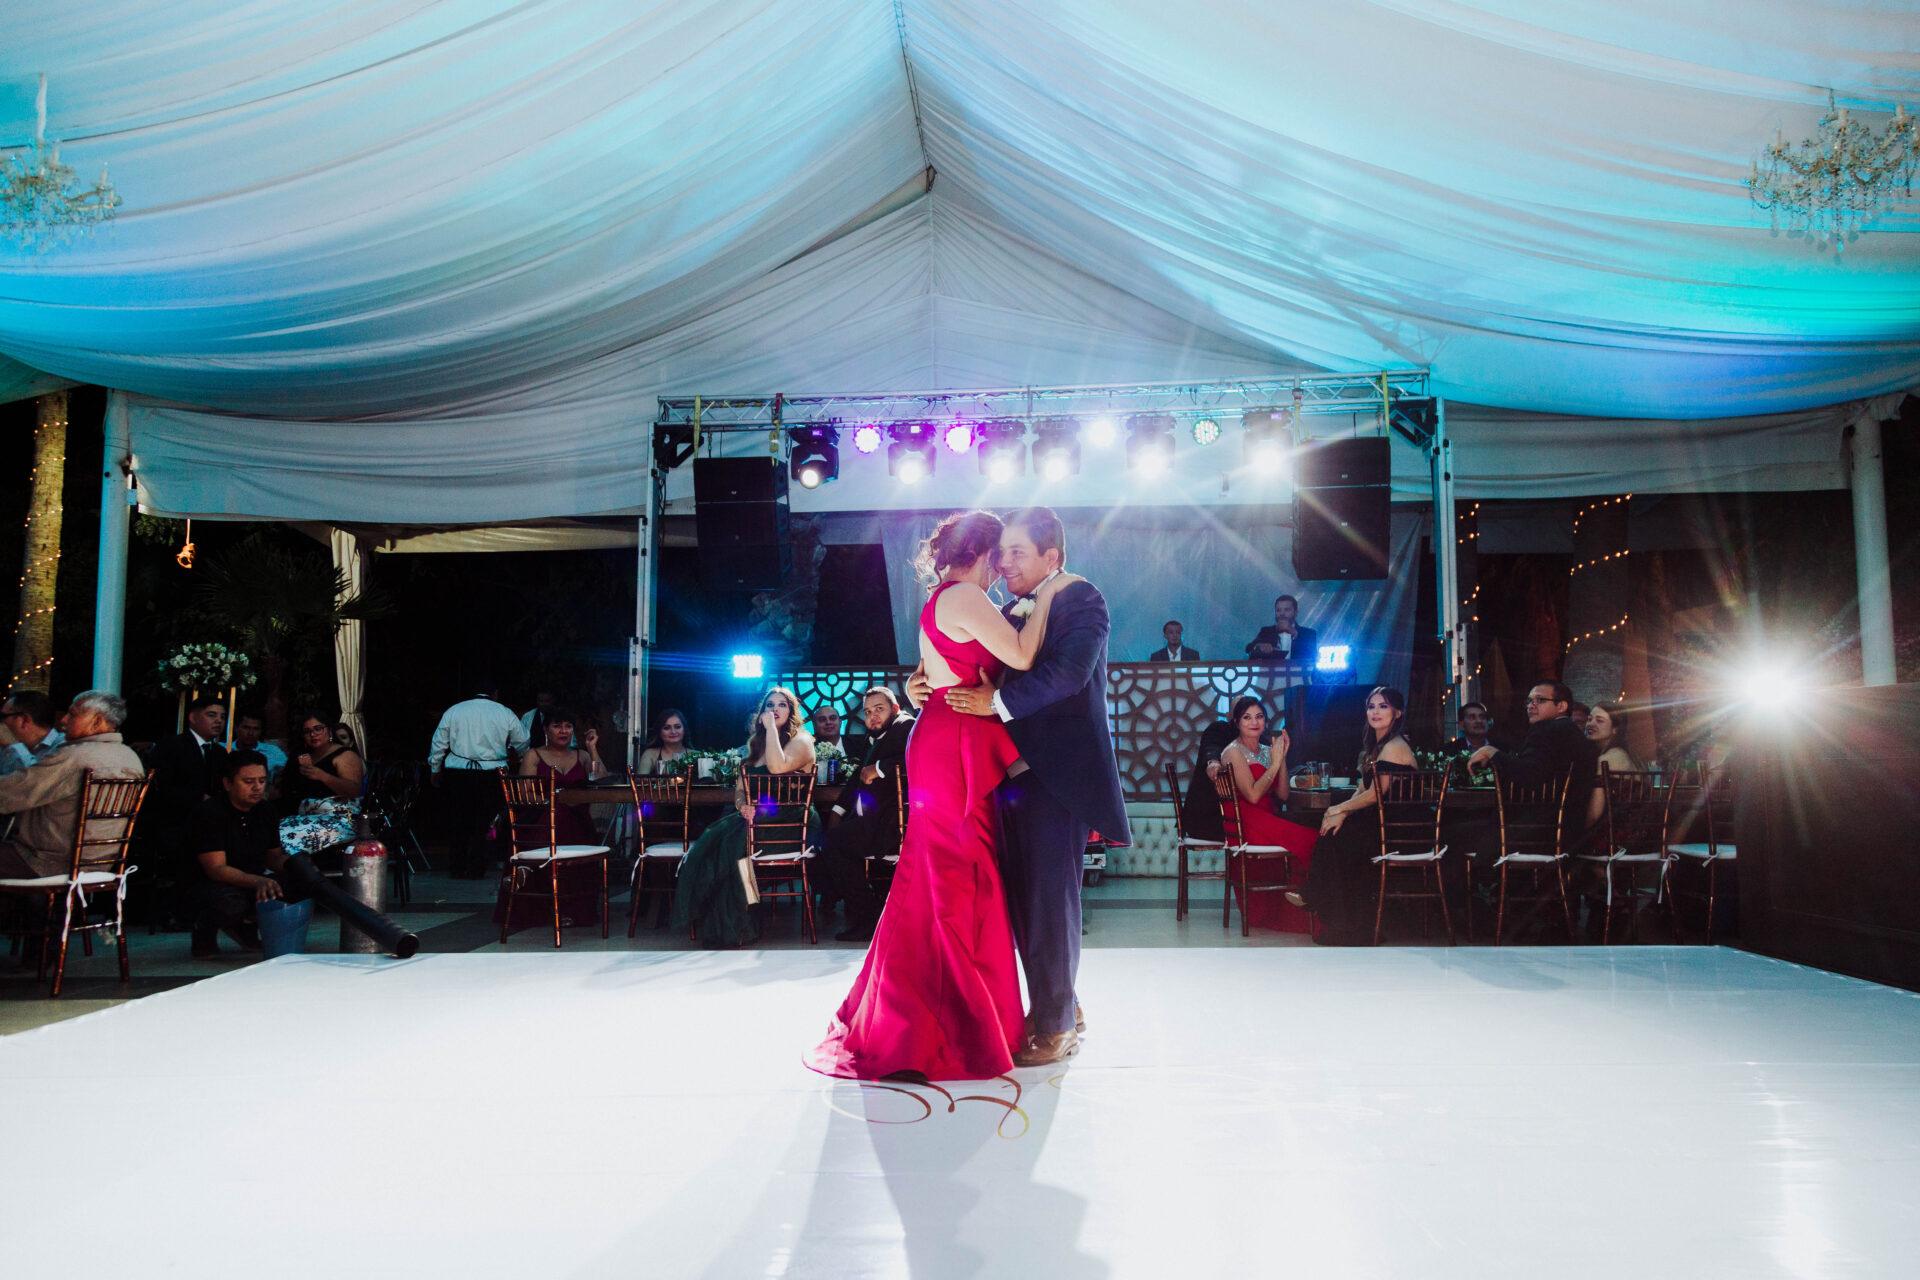 javier_noriega_fotografo_bodas_torreon_coahuila_zacatecas_wedding_photographer53a